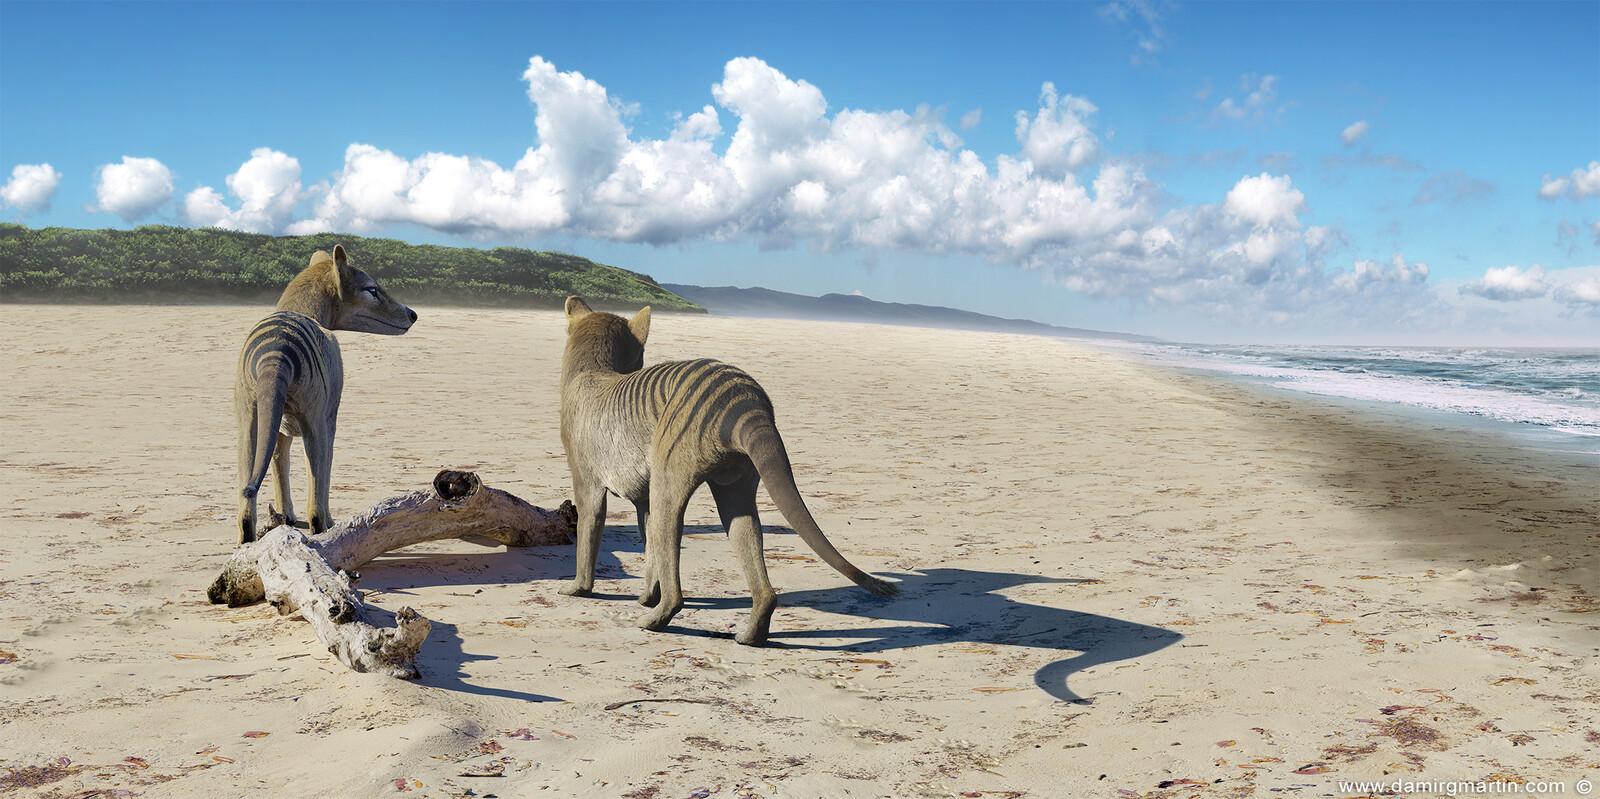 Thylacine At The Beach